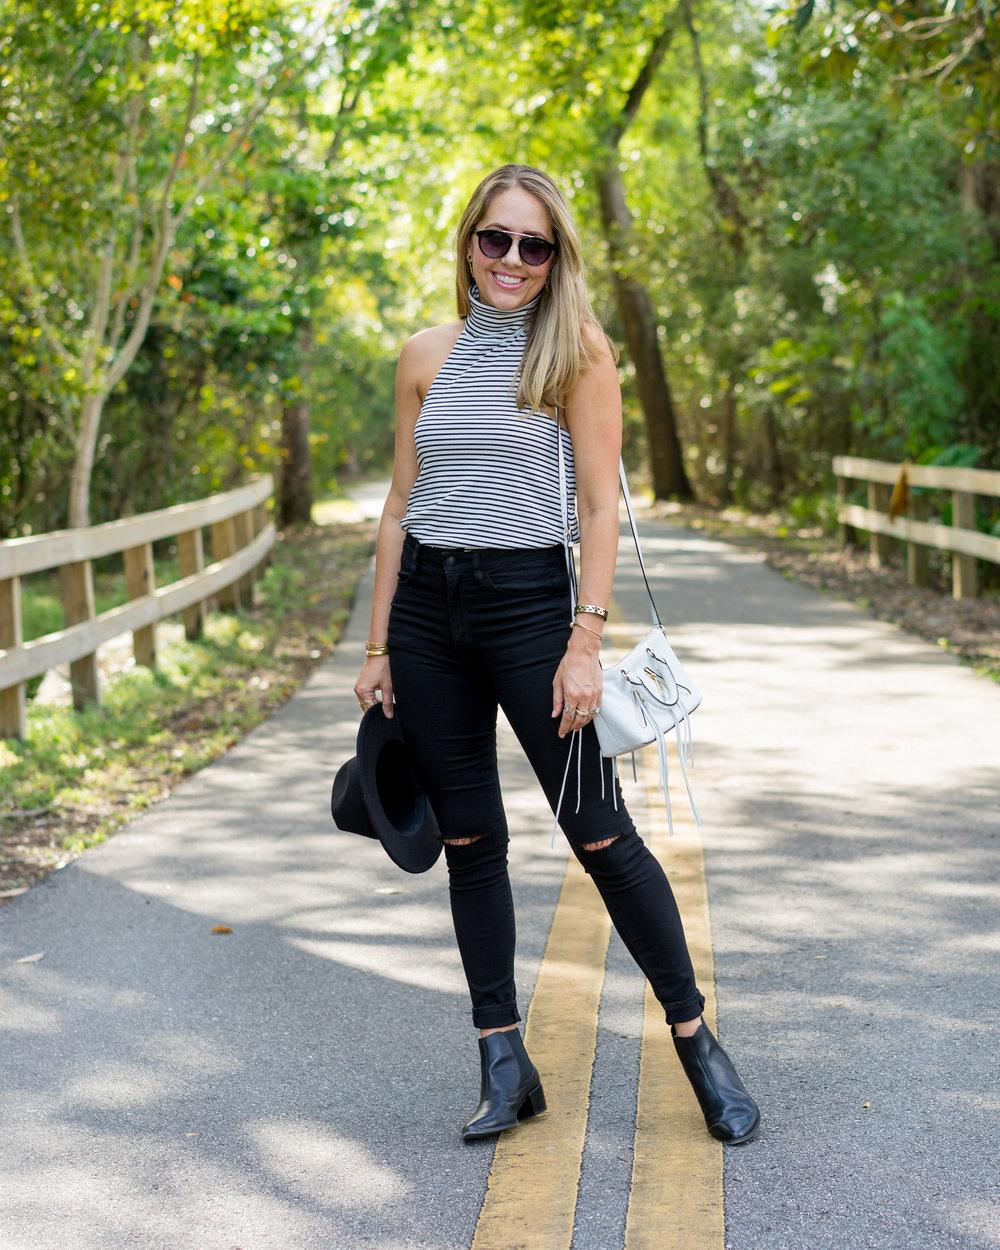 Stripe sleeveless turtleneck, high waist jeans, chelsea boots